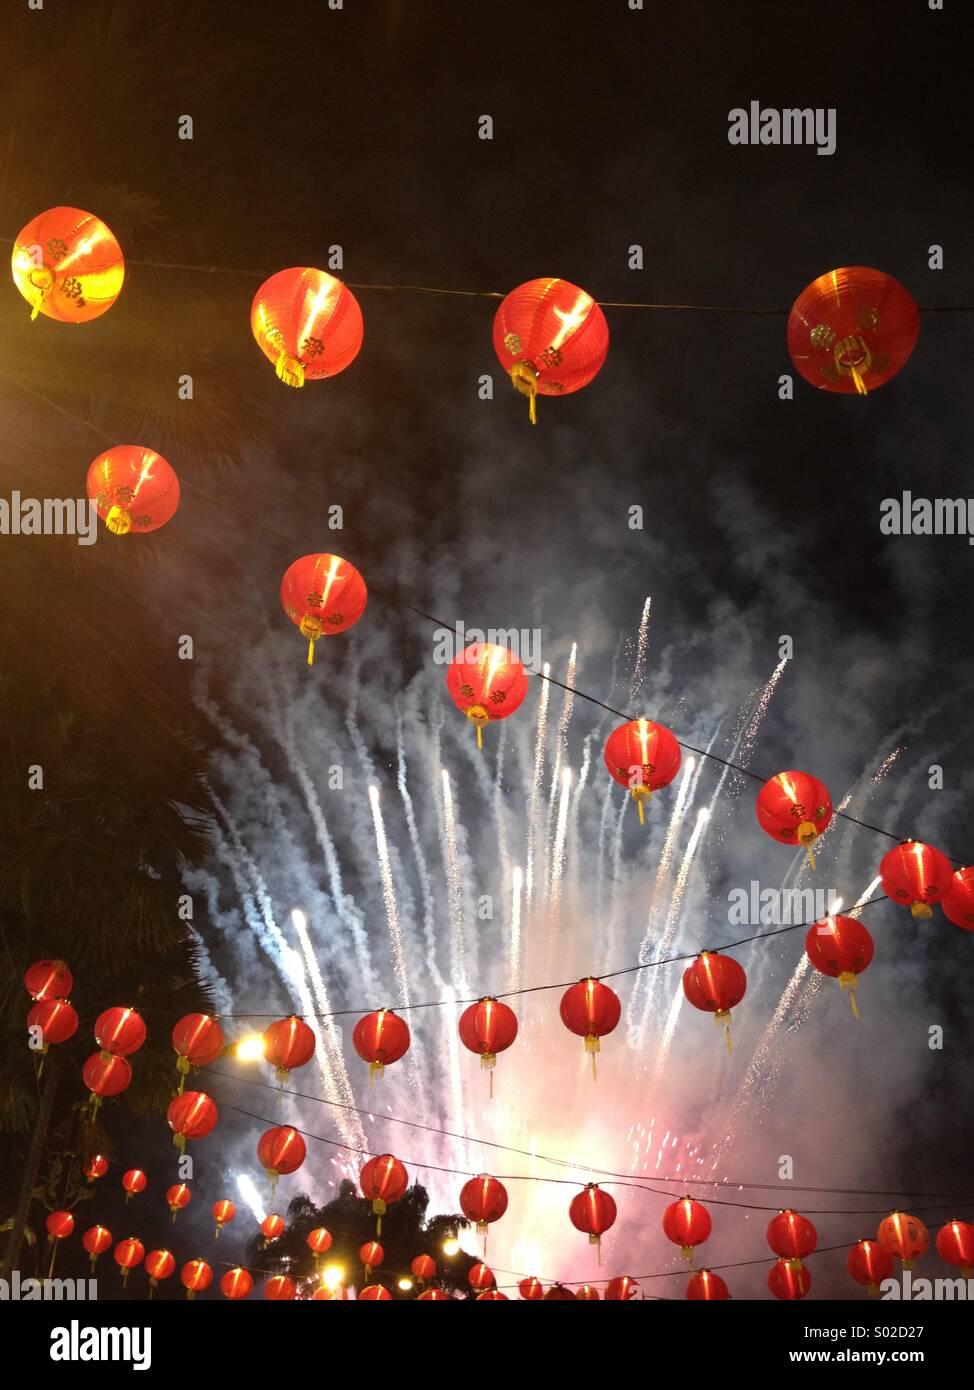 Chinese New Year Laternen Feuerwerk Stockbild